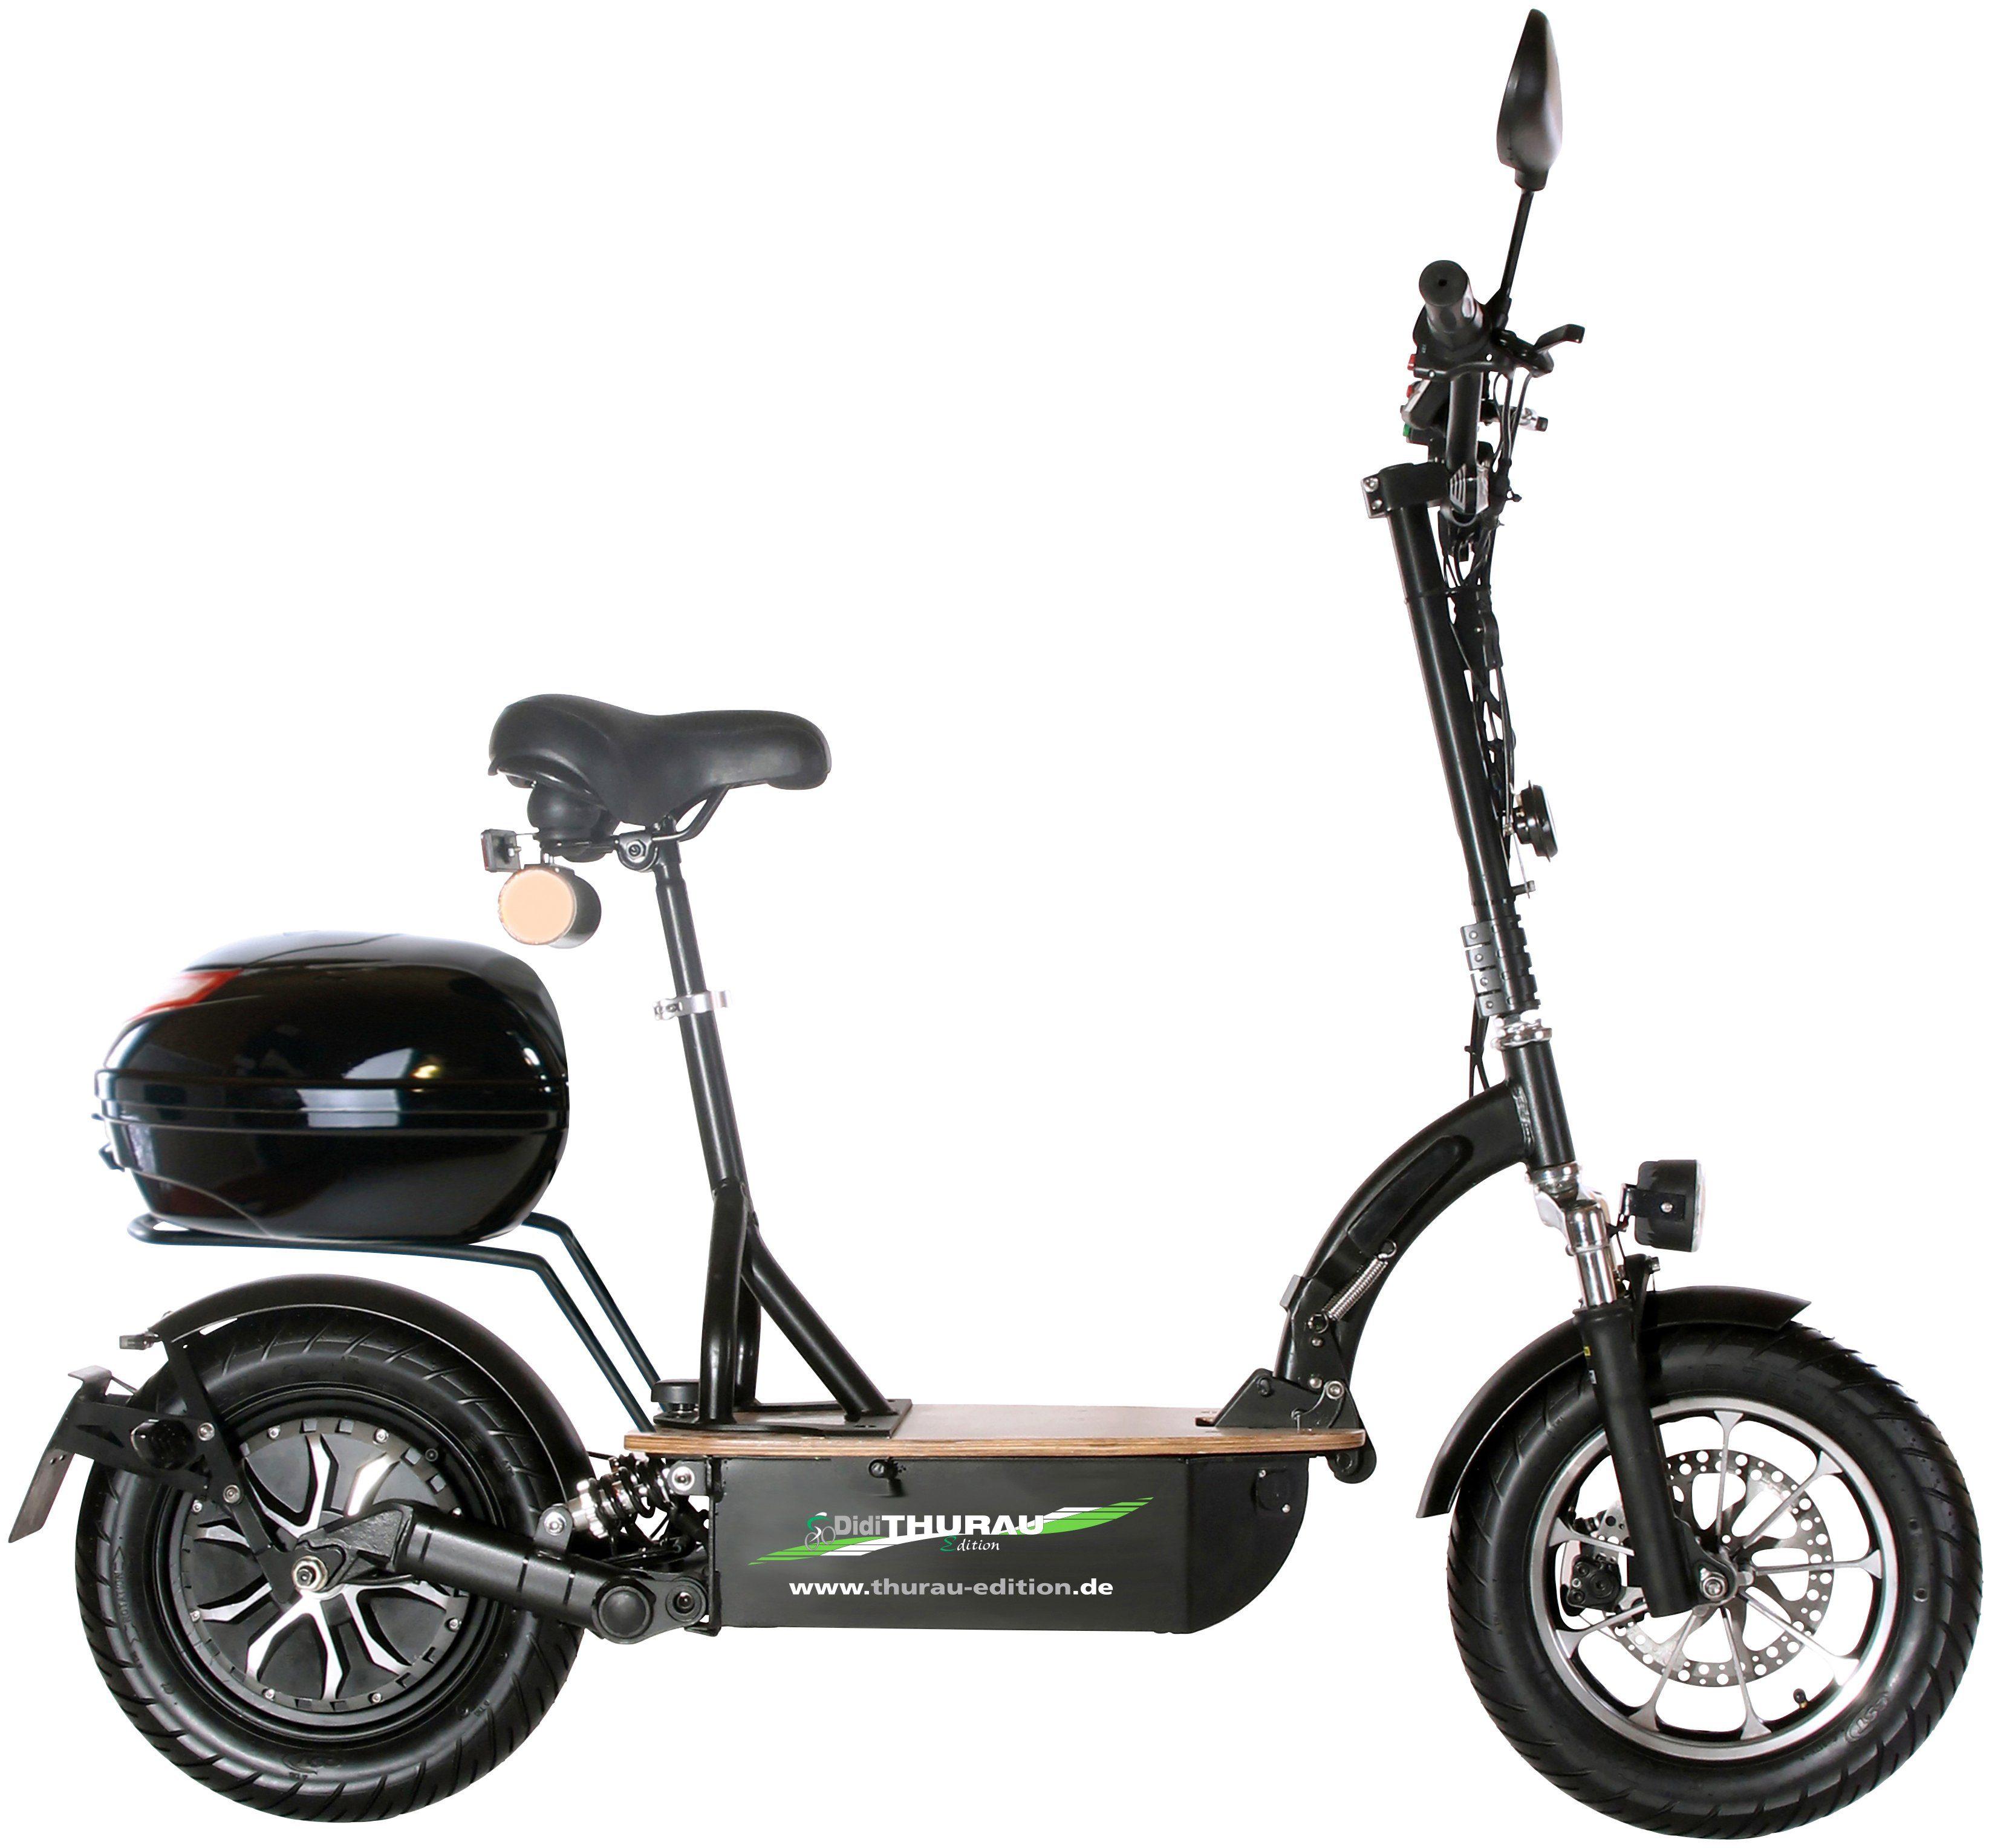 DIDI THURAU E-Scooter »Eco-Tourer Safety Plus RS«, 45 km/h, Inkl. Rundum-Sorglos-Paket